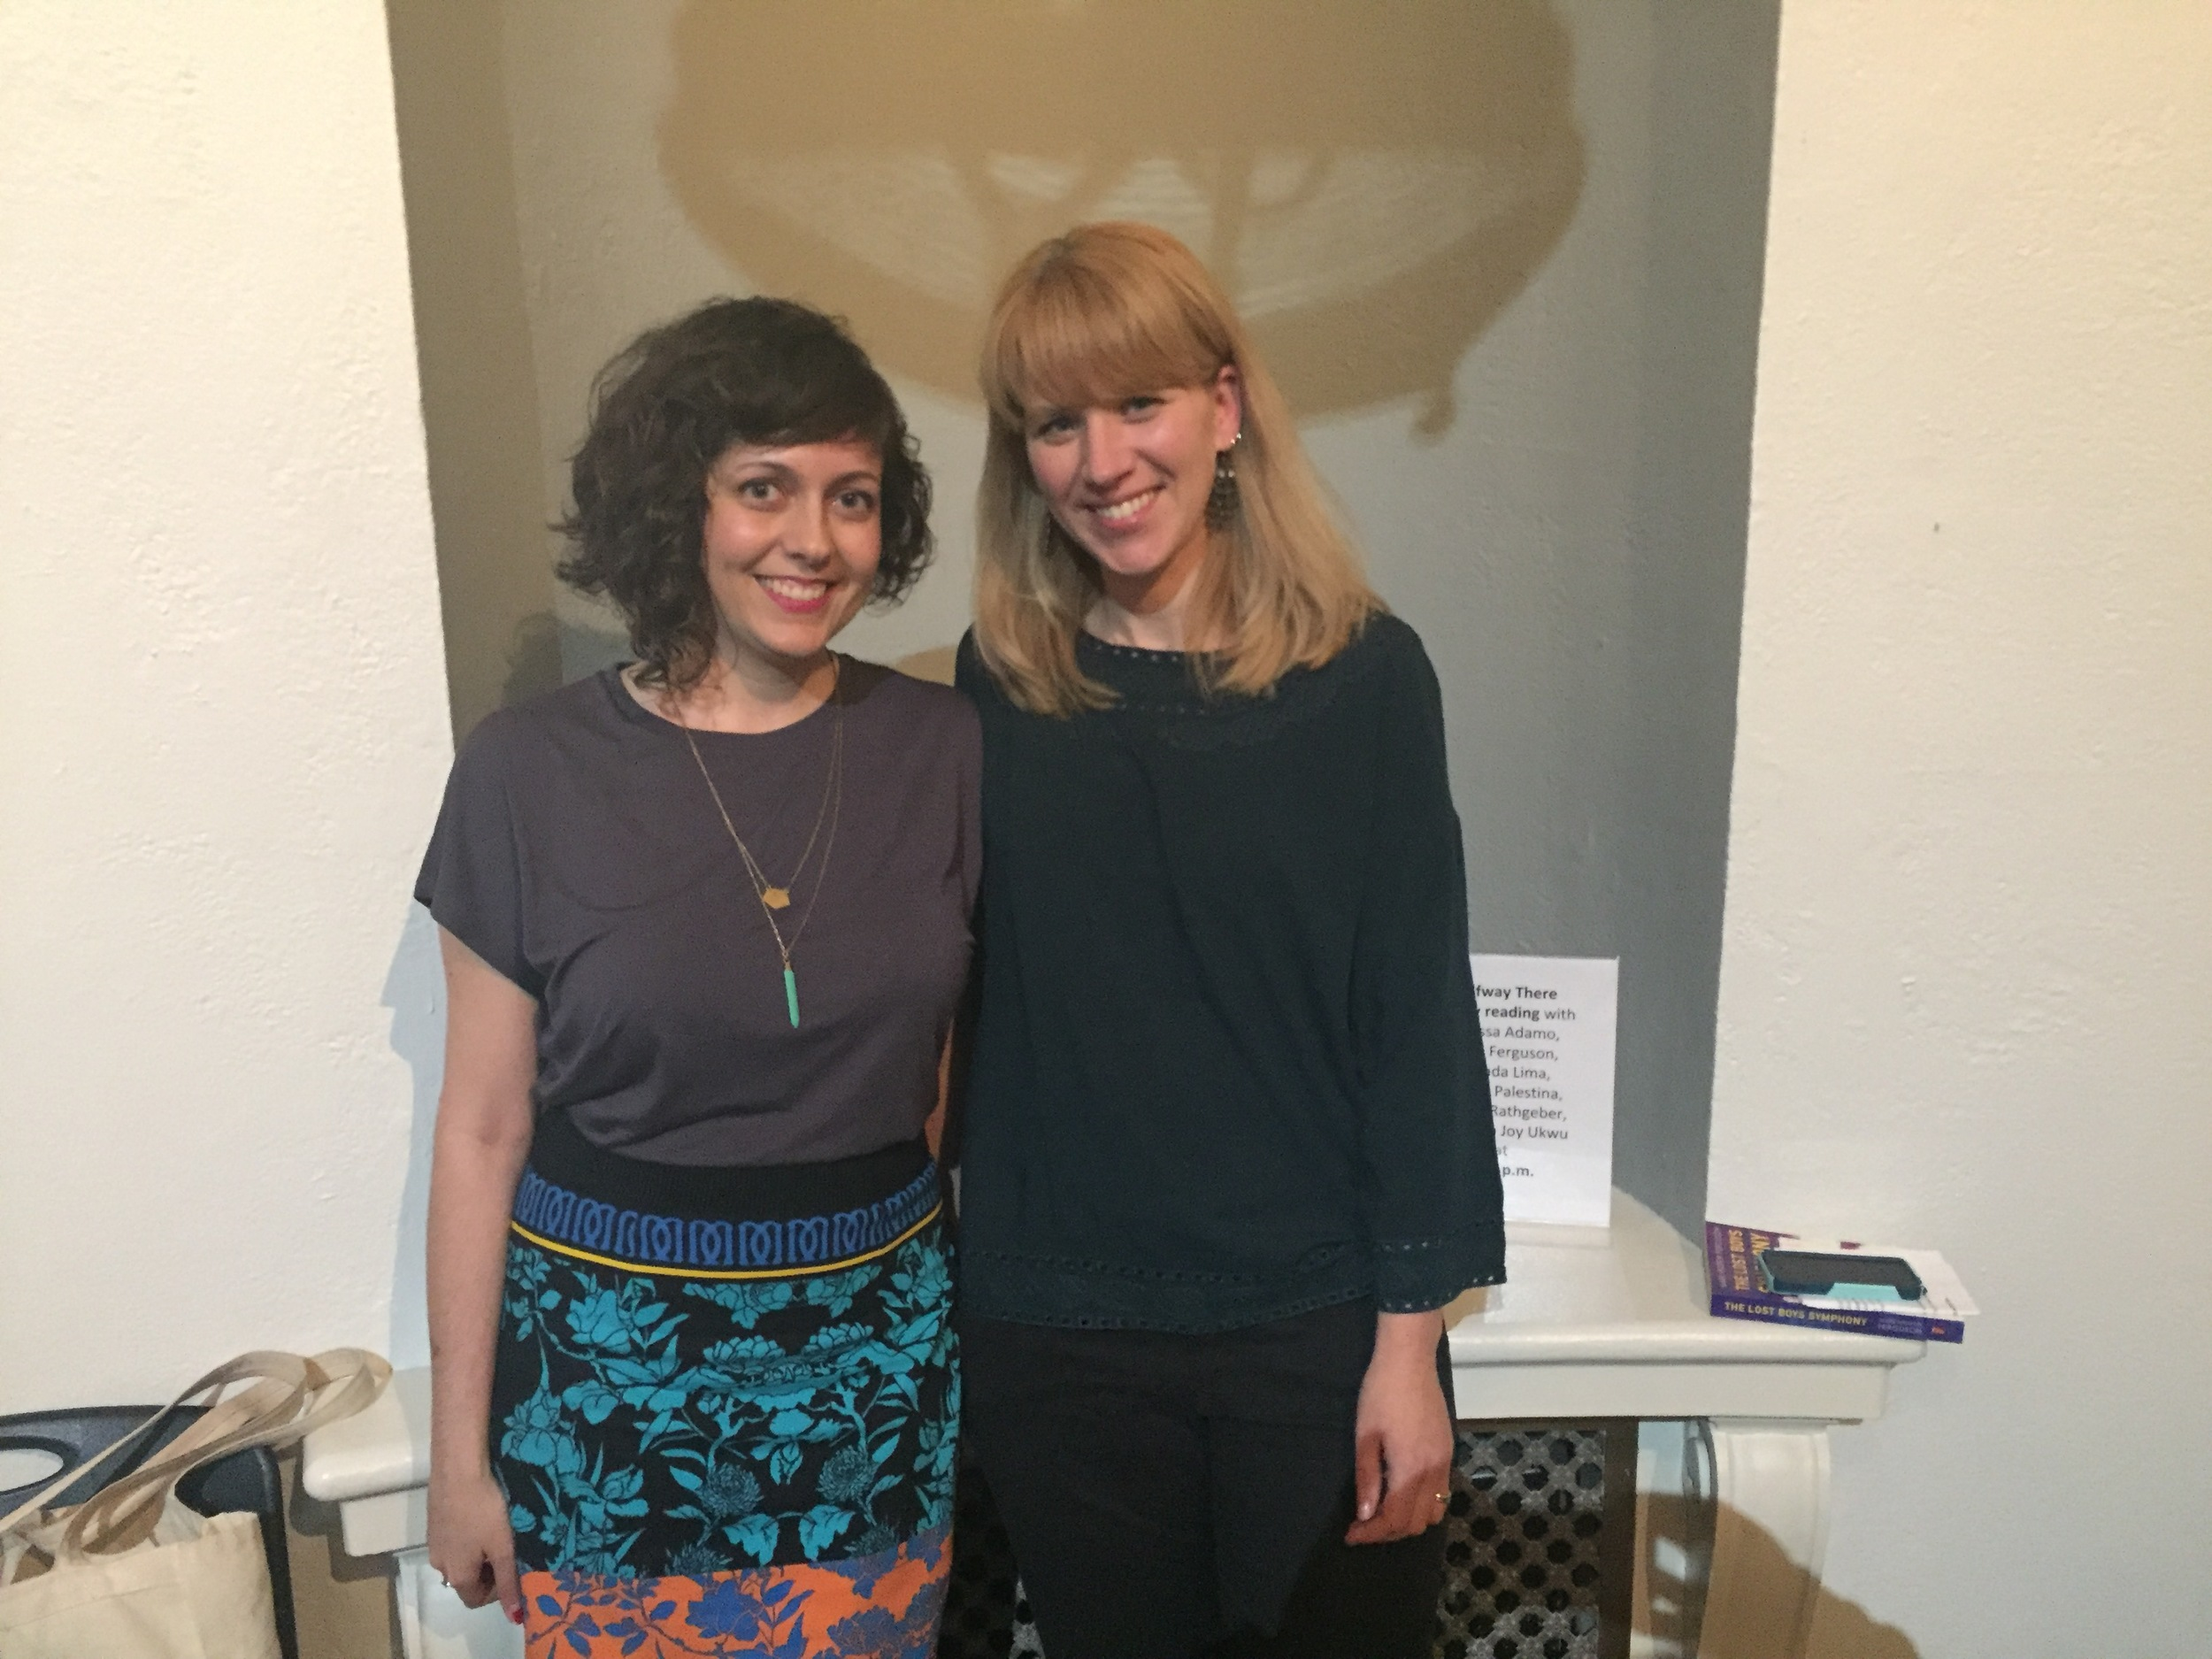 Nicole and Apryl, co-curators